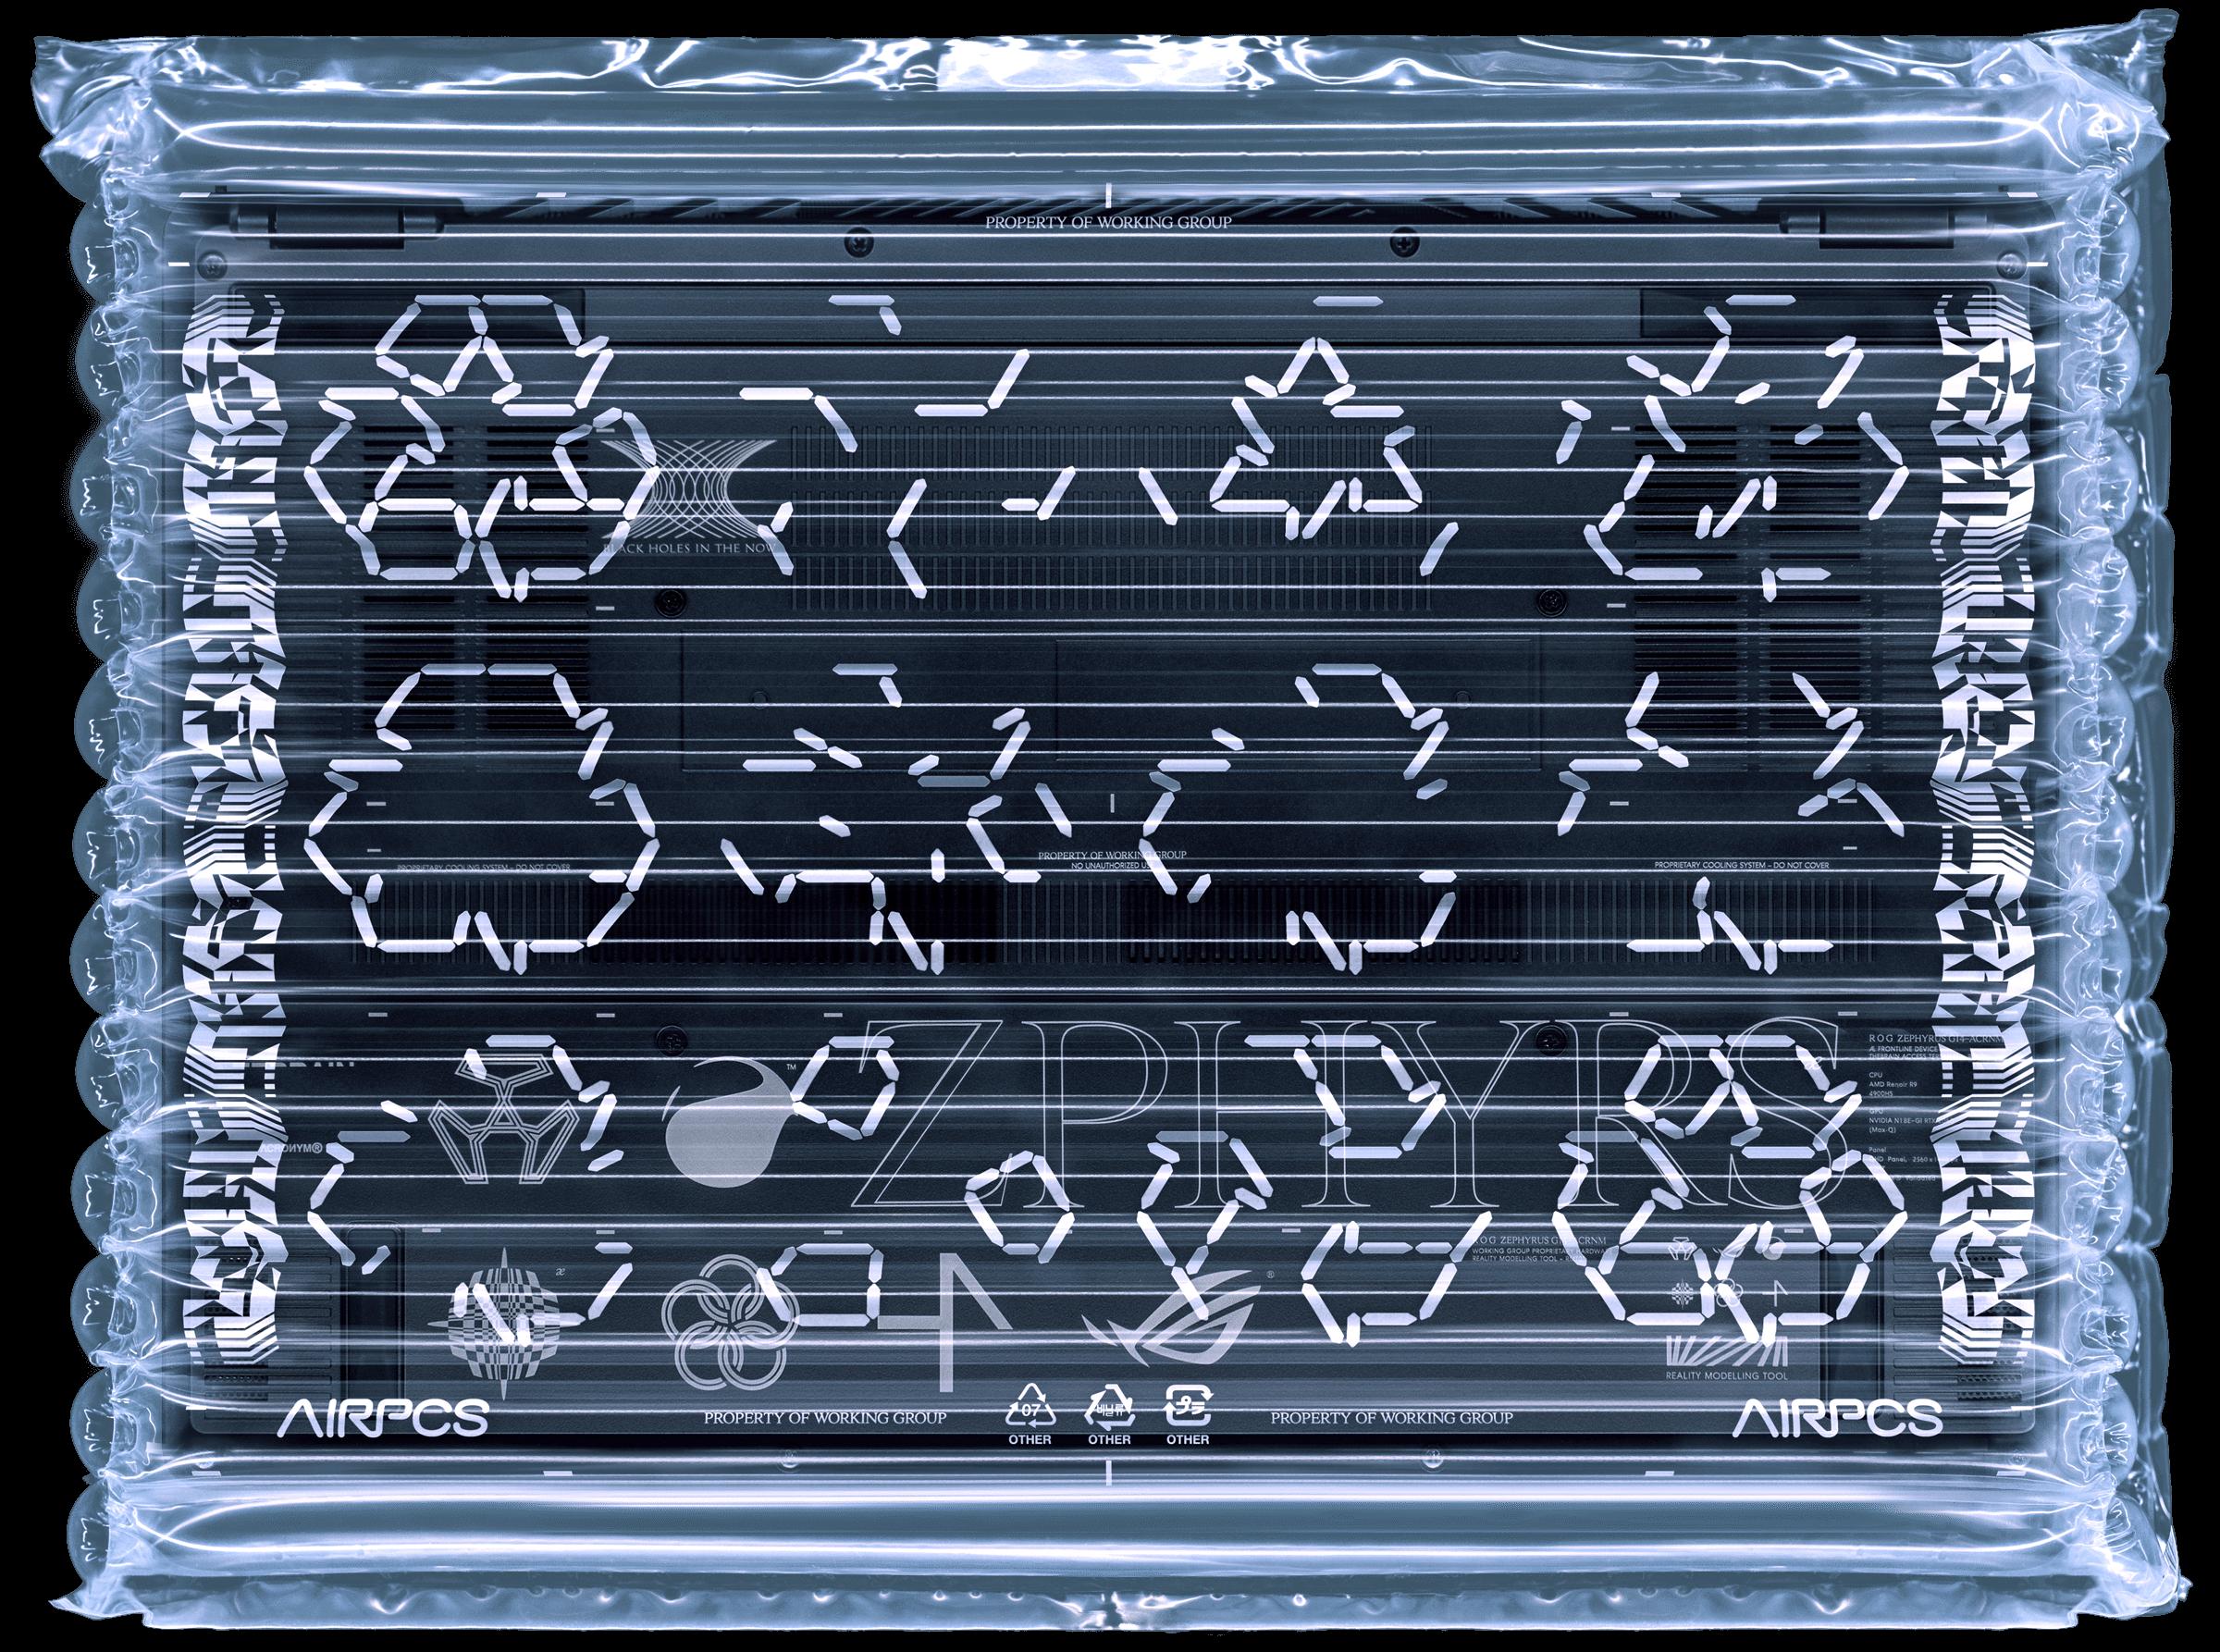 ROG與ACRONYM推出ROG幻14-ACRNM 限定版